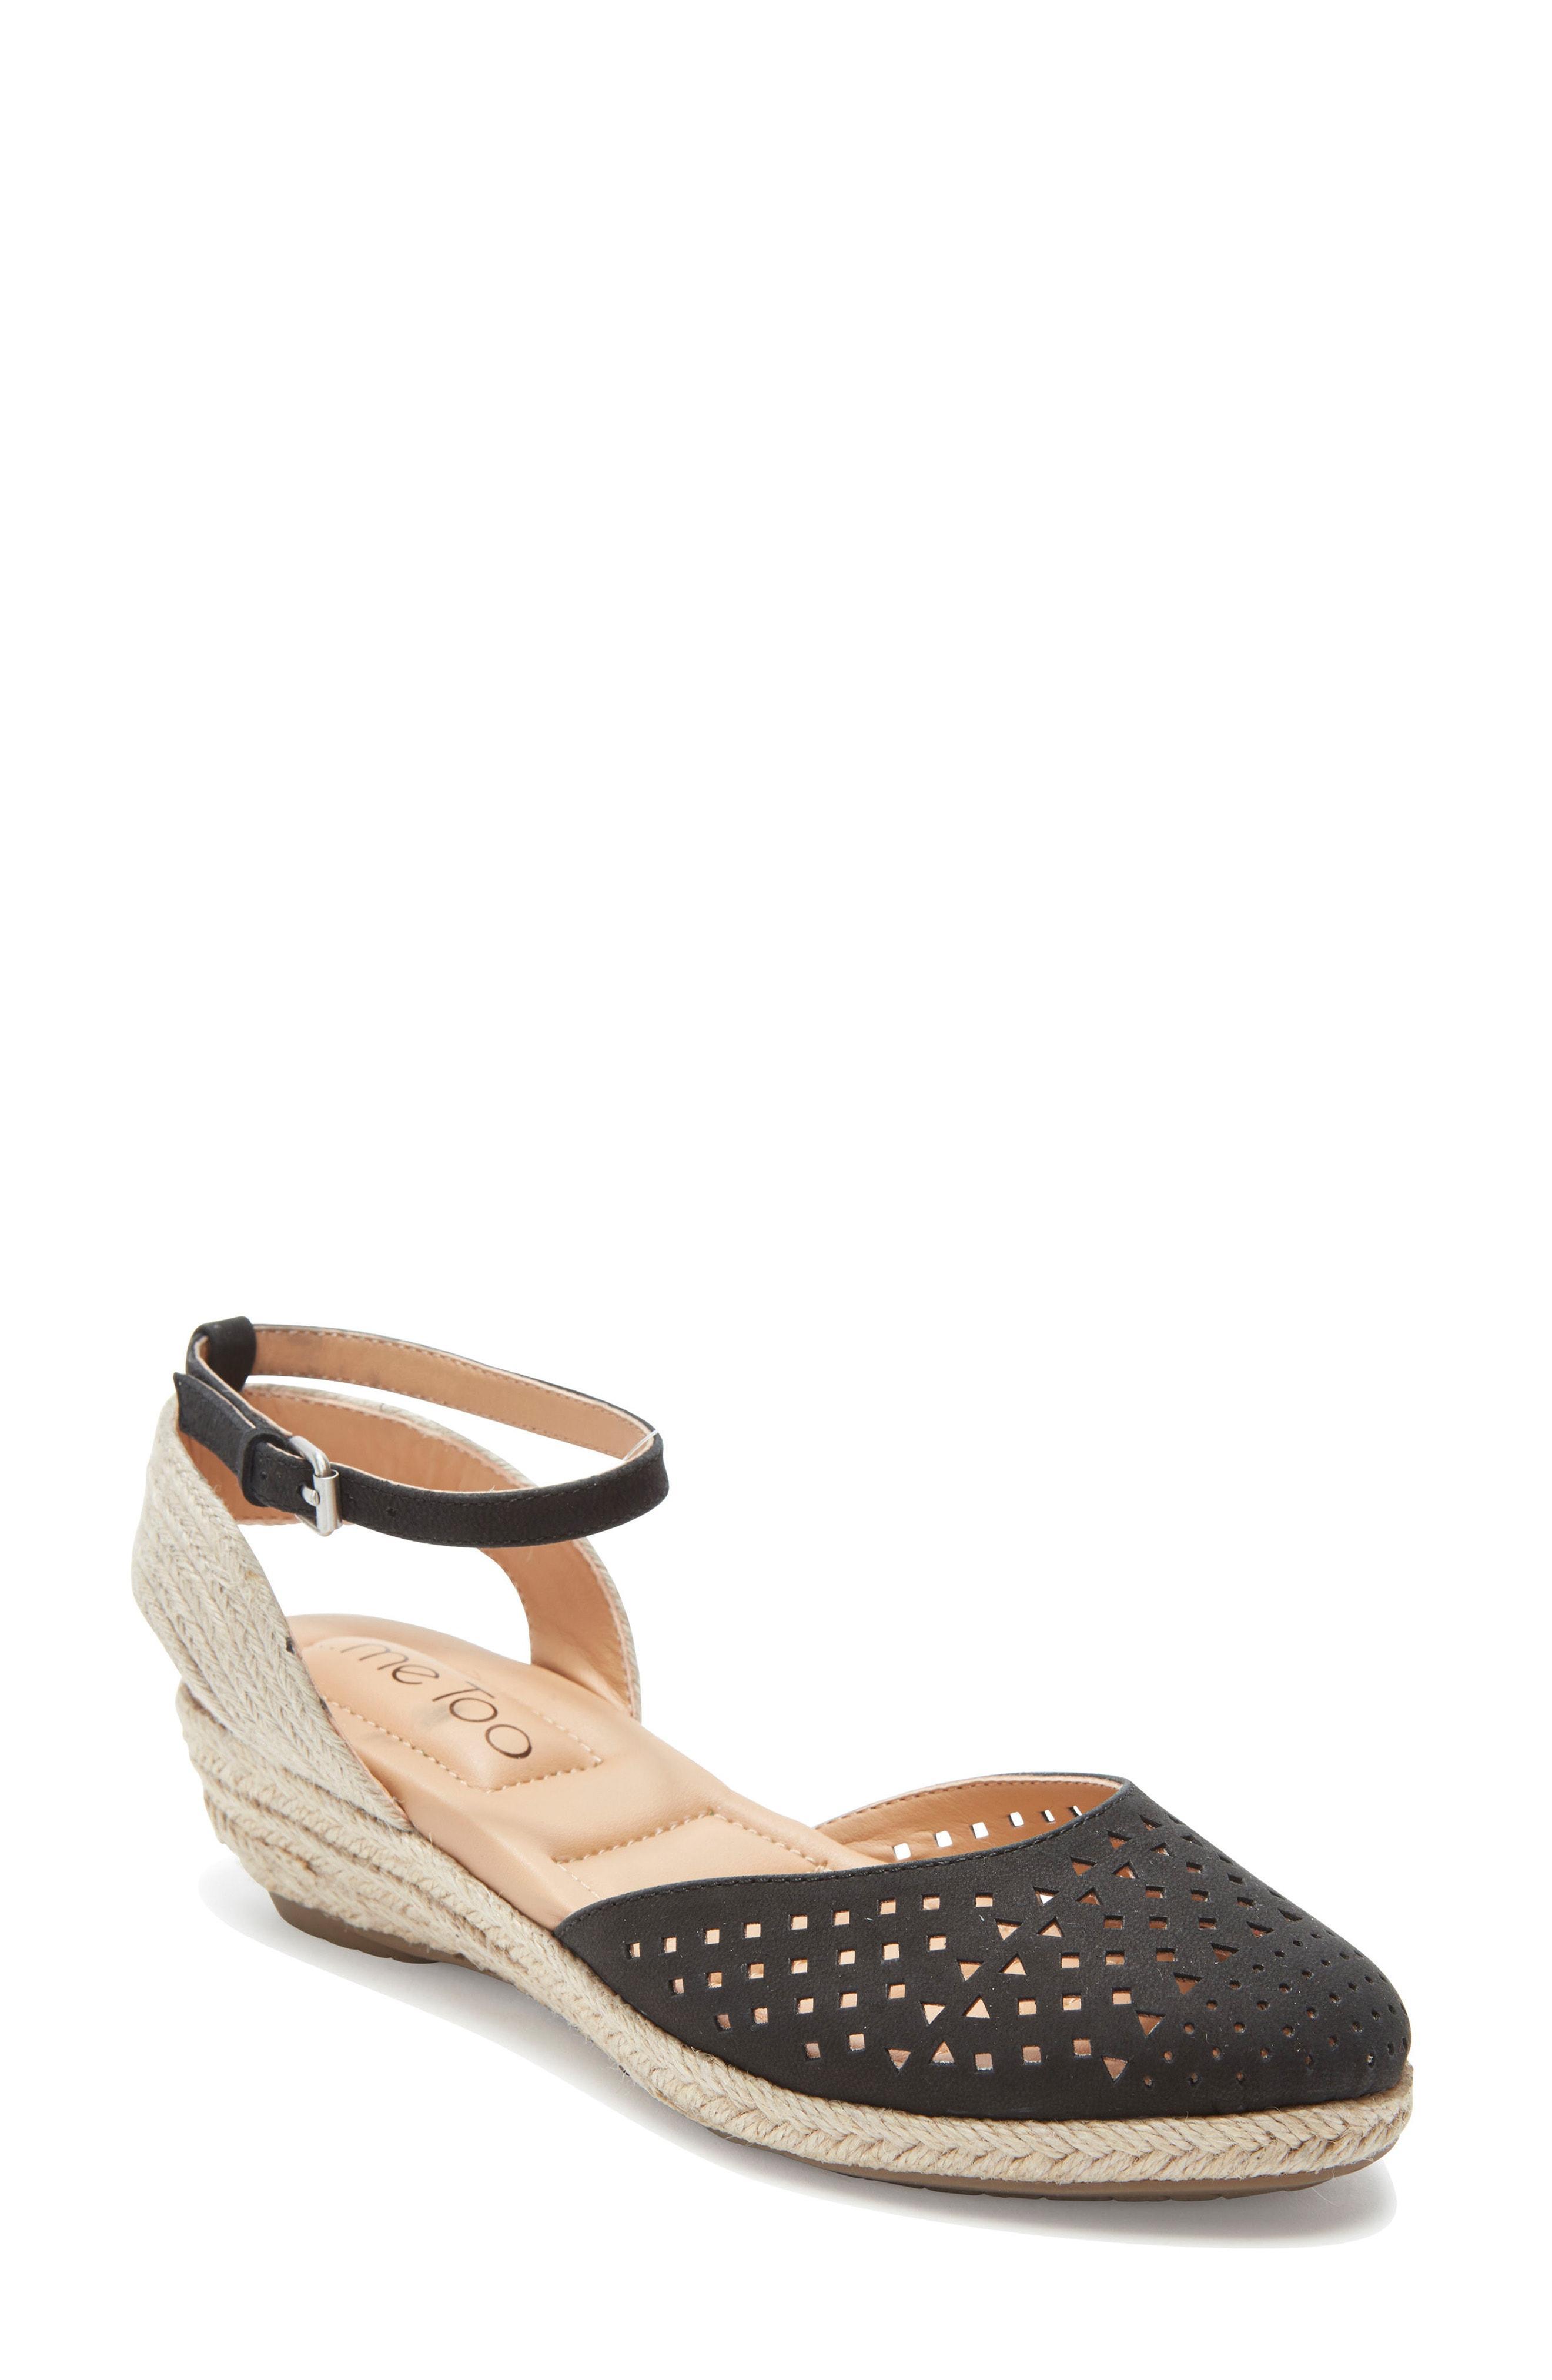 6fadaa54c7 Lyst - Me Too Norina Espadrille Sandal in Brown